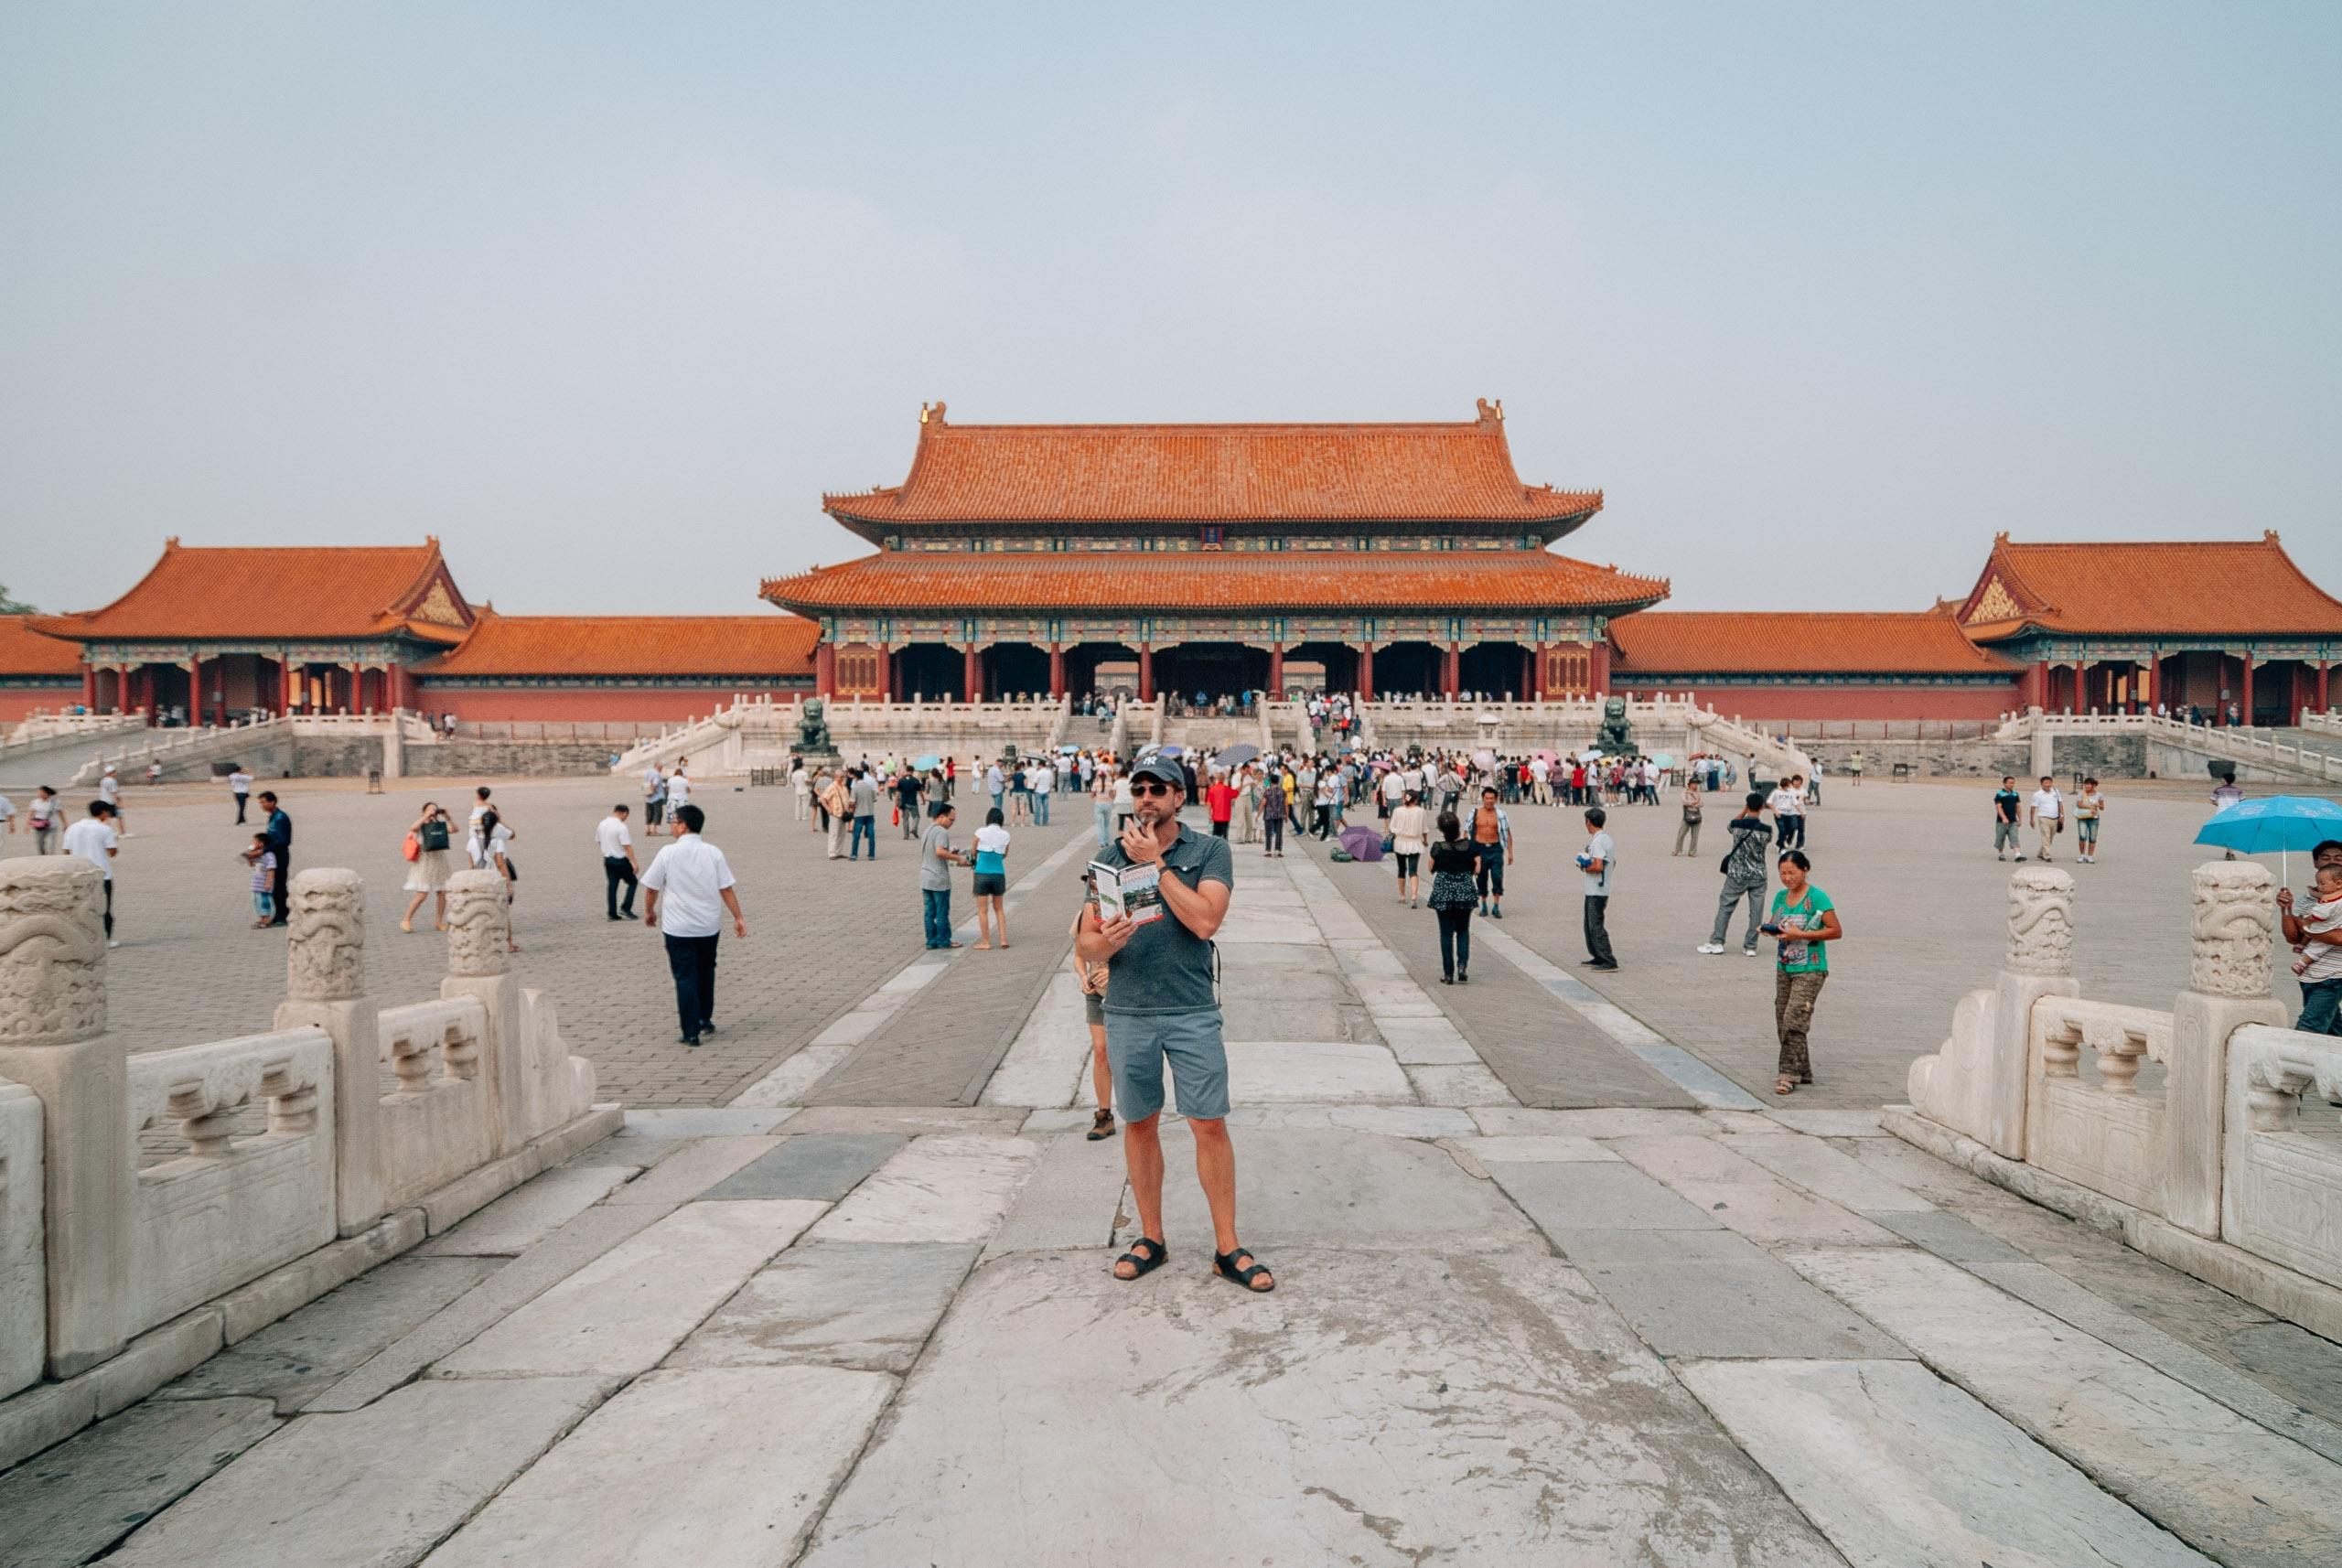 China - Beijing & The Great Wall - 2010-0903-DSC_0324_108407